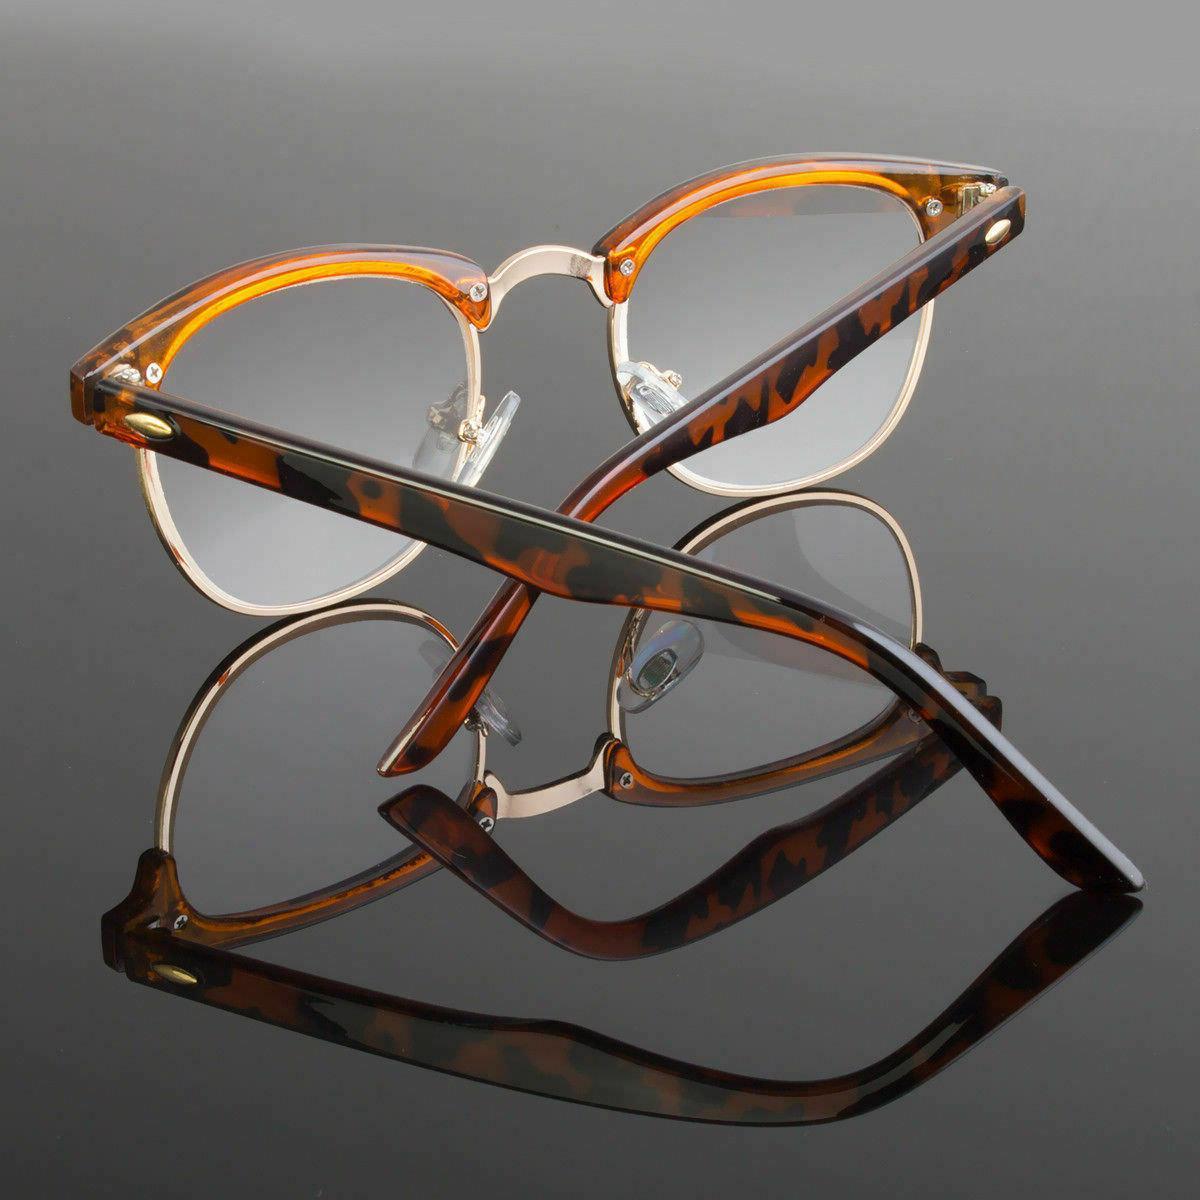 Interview Smart Lens Glasses 100%